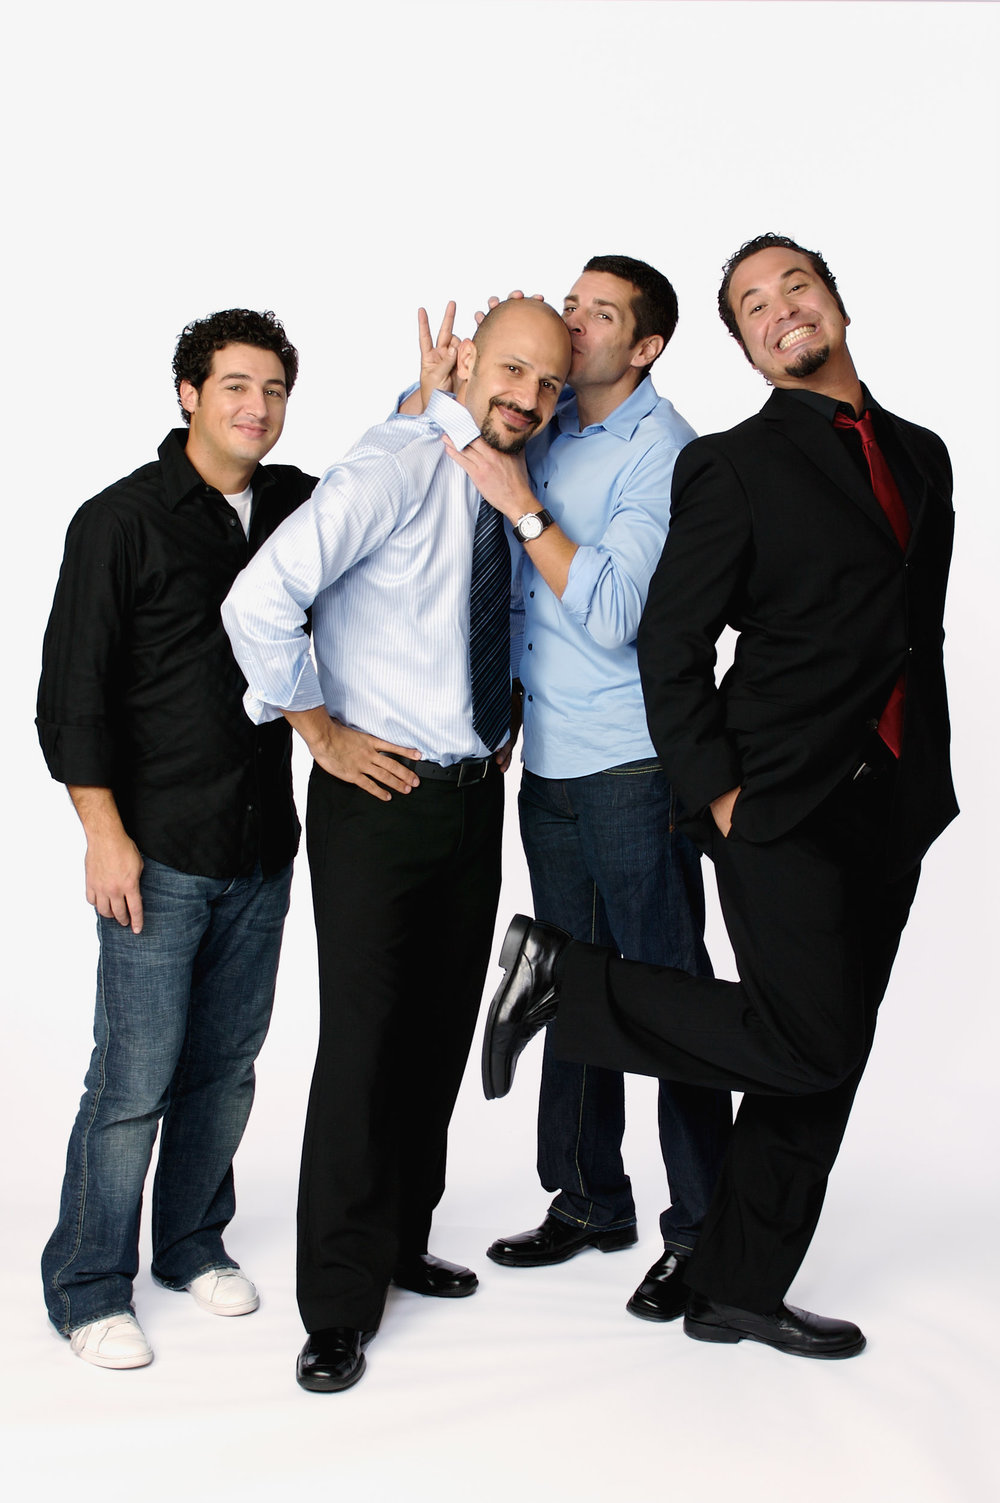 Aron Kader, Maz Jobrani, Dean Obeidallah & Ahmed Ahmed